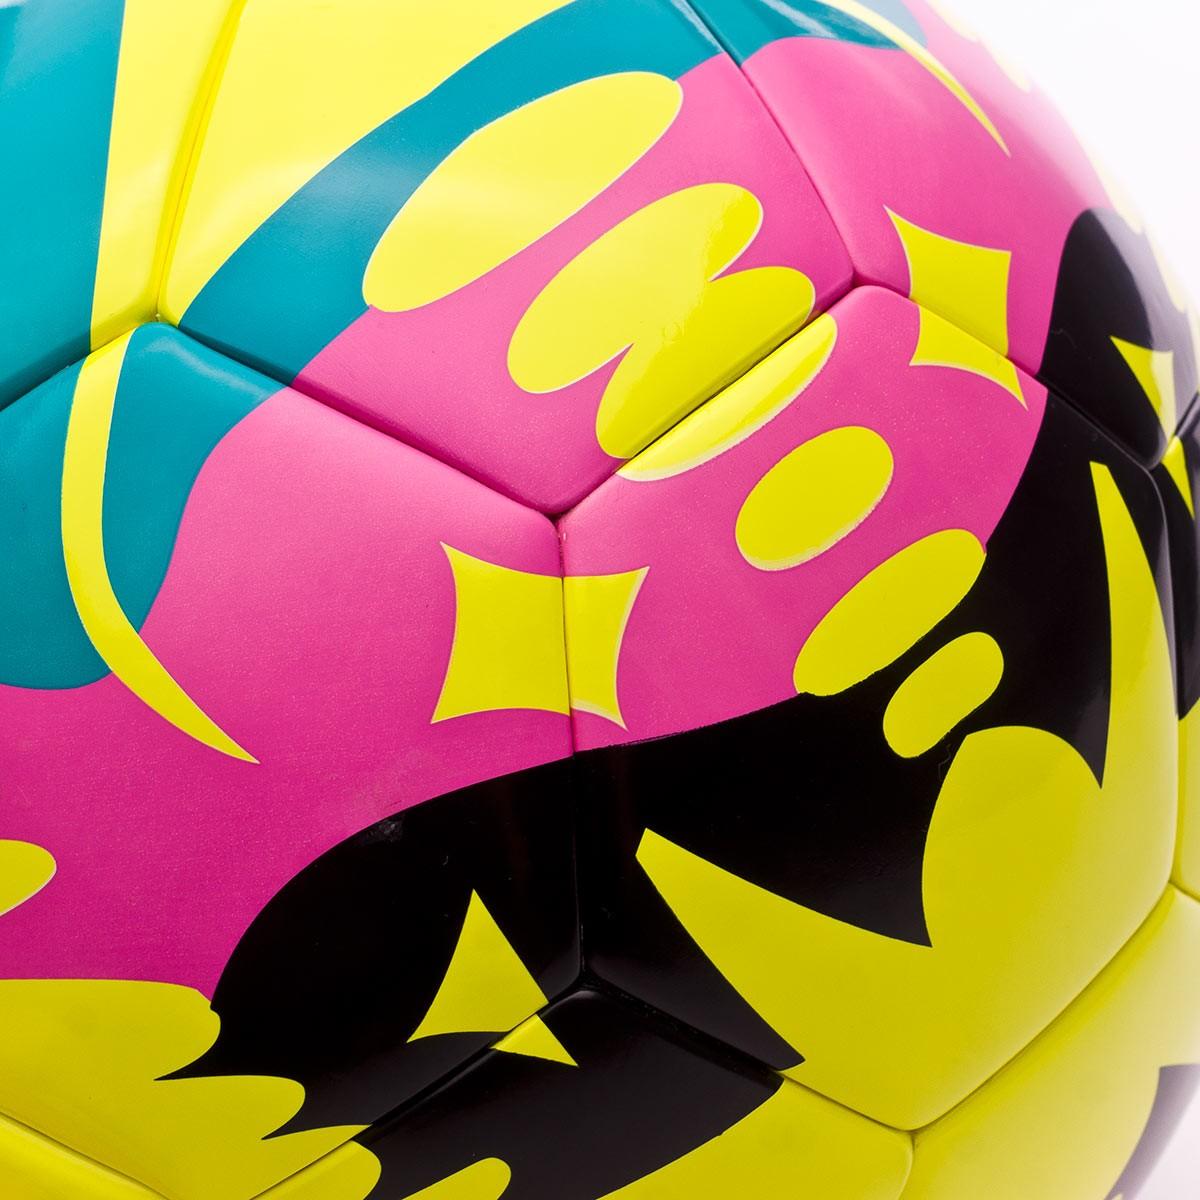 Ball Kelme Olimpo Gold Replica LNFS 2017-2018 Yellow - Soloporteros es  ahora Fútbol Emotion d9ad09144